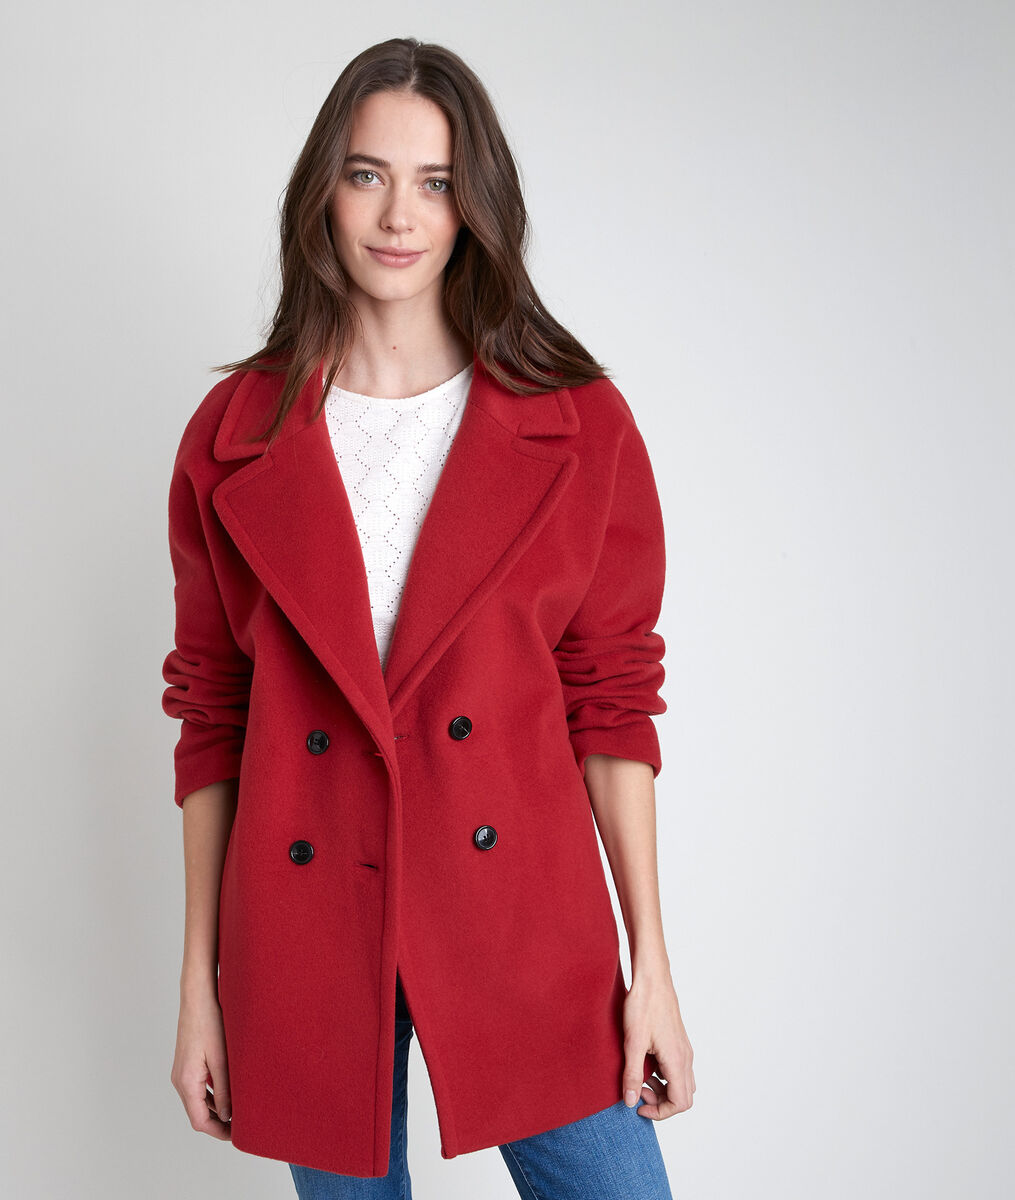 Mantel aus Woll-Mix Tomette Joy PhotoZ | 1-2-3